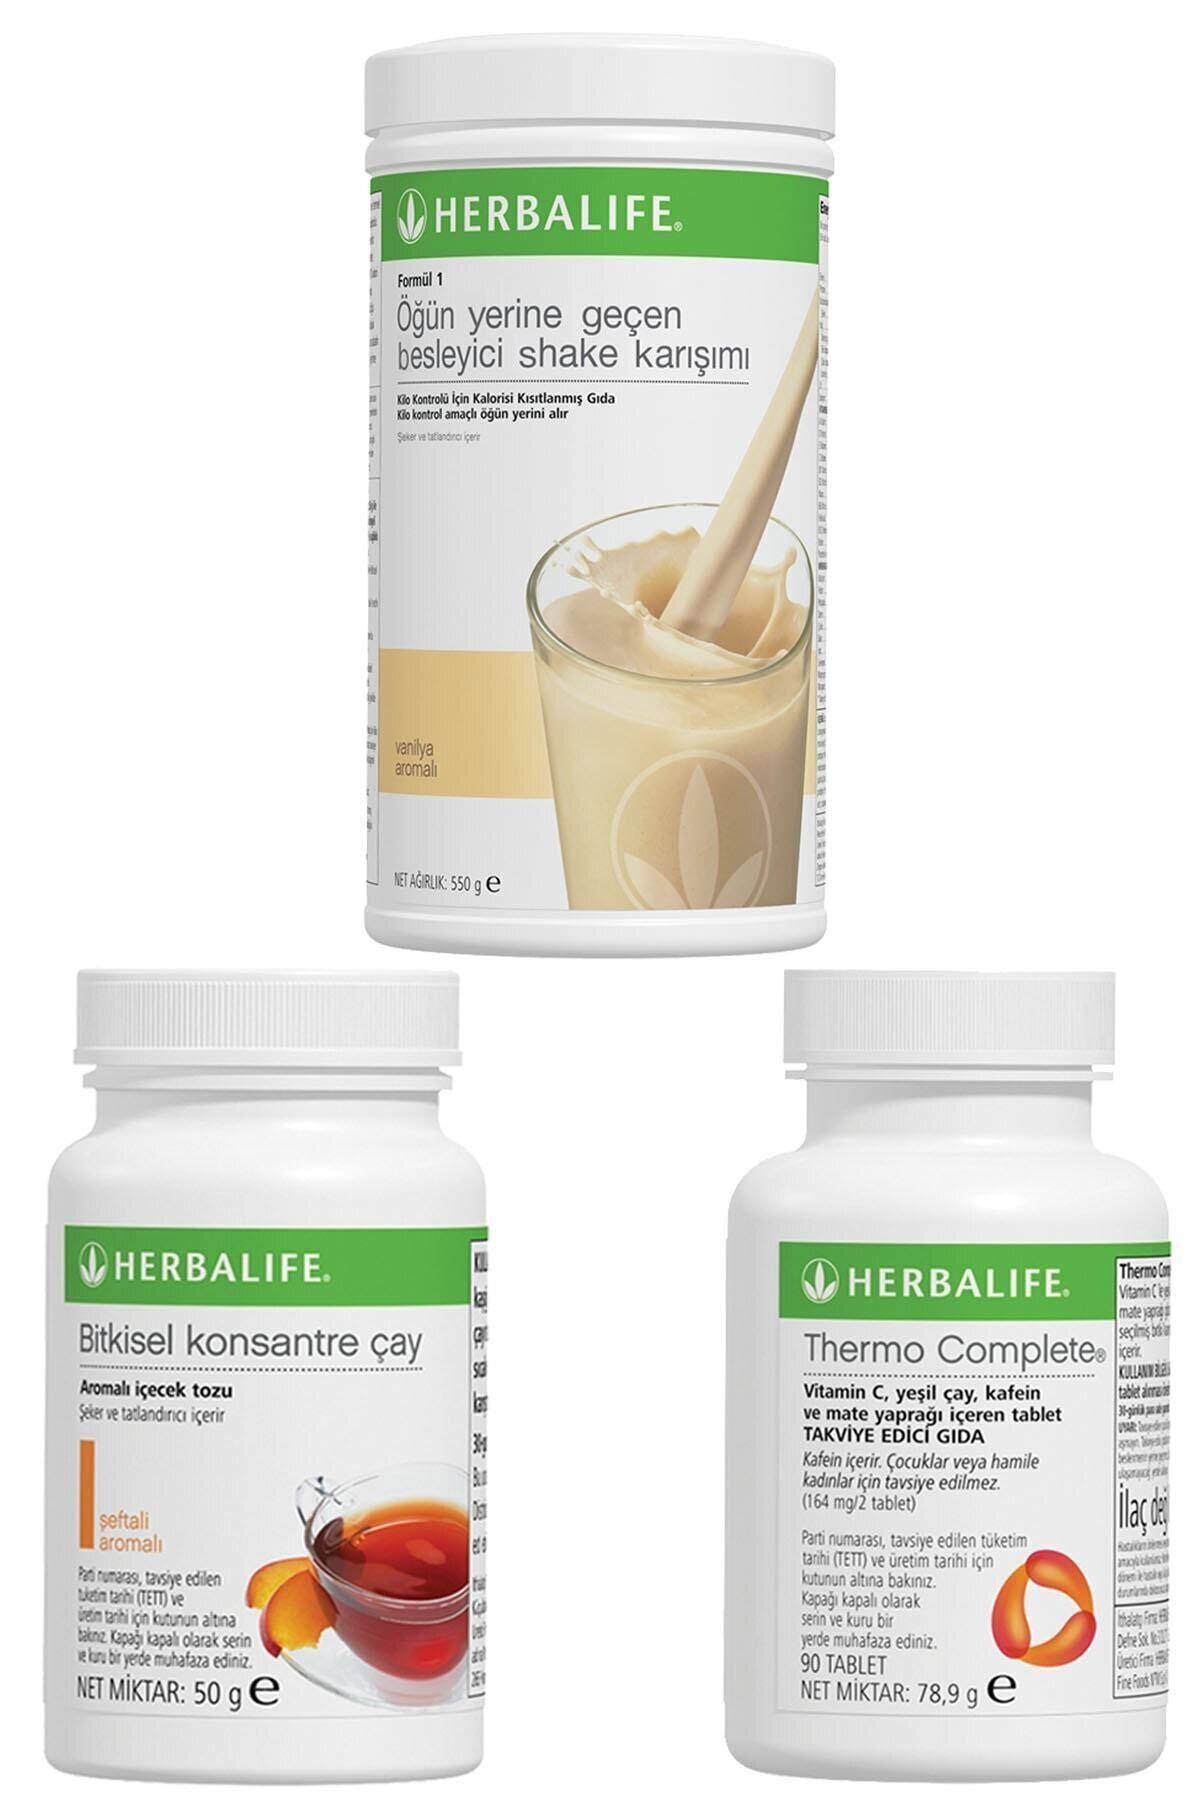 Herbalife Shake Vanilyalı, Thermo Complete, Şeftali Çay 50gr Birer Adet 1